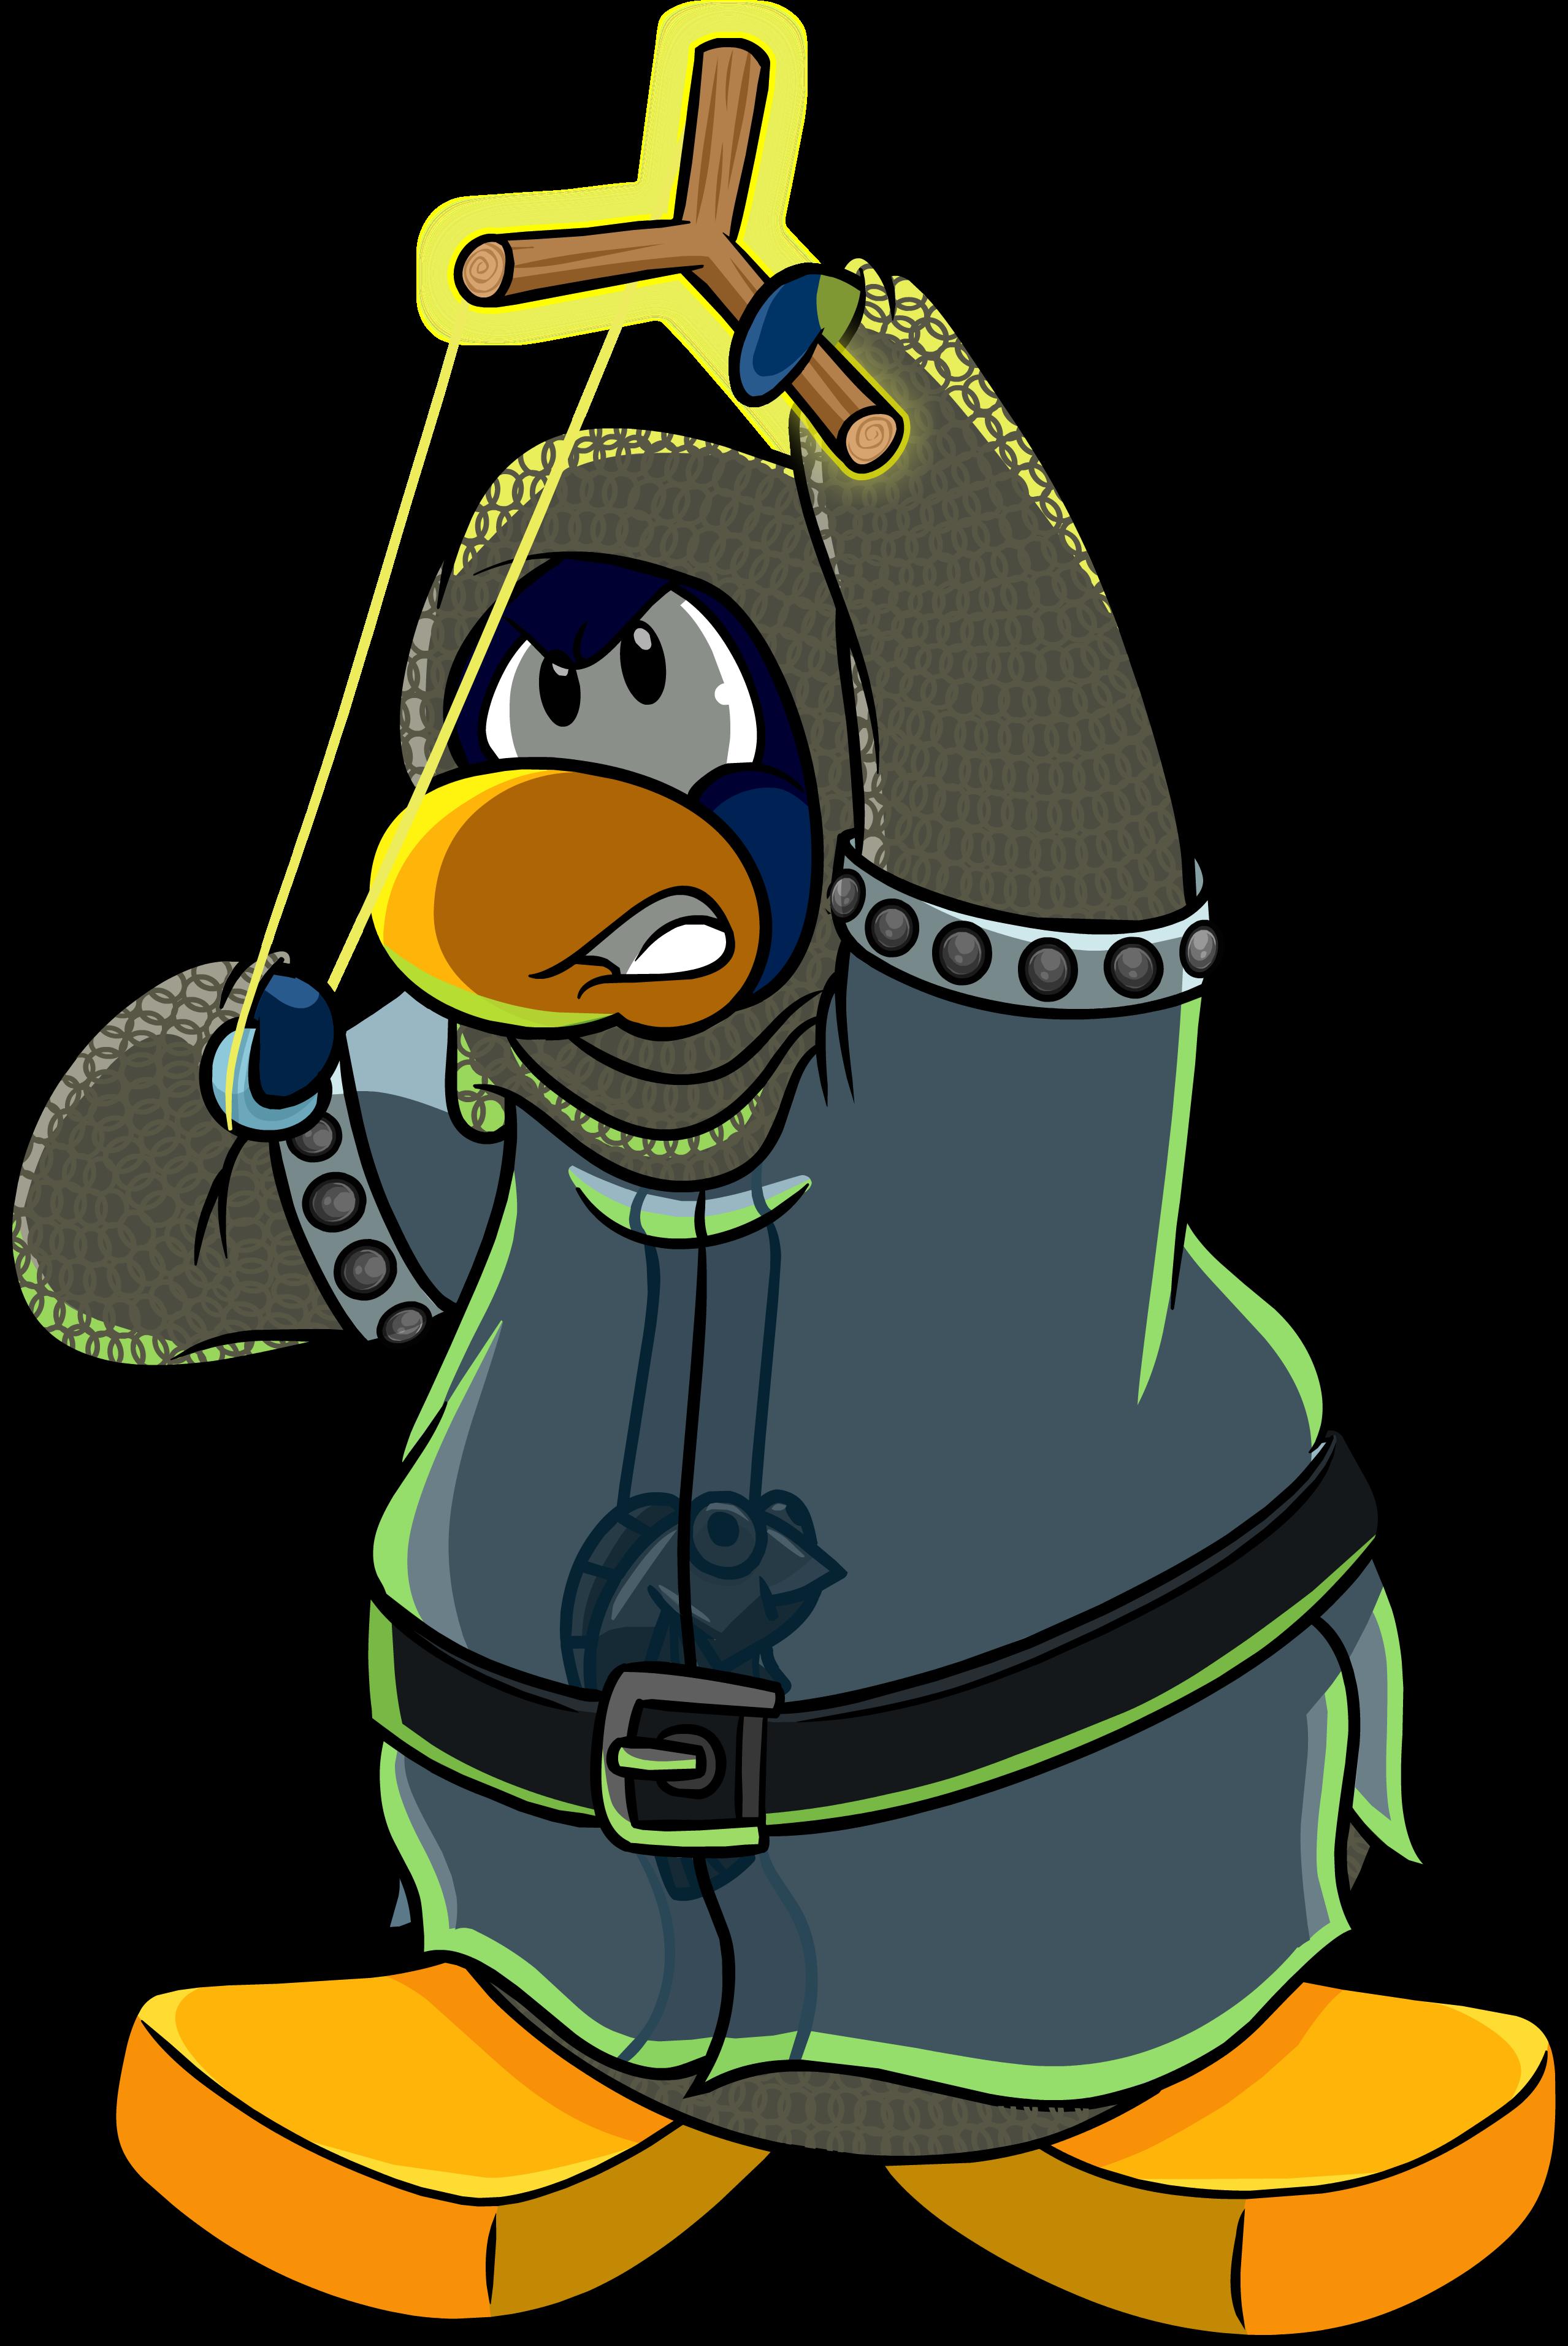 G Club Penguin Wiki Fairy Branch | Club Pe...